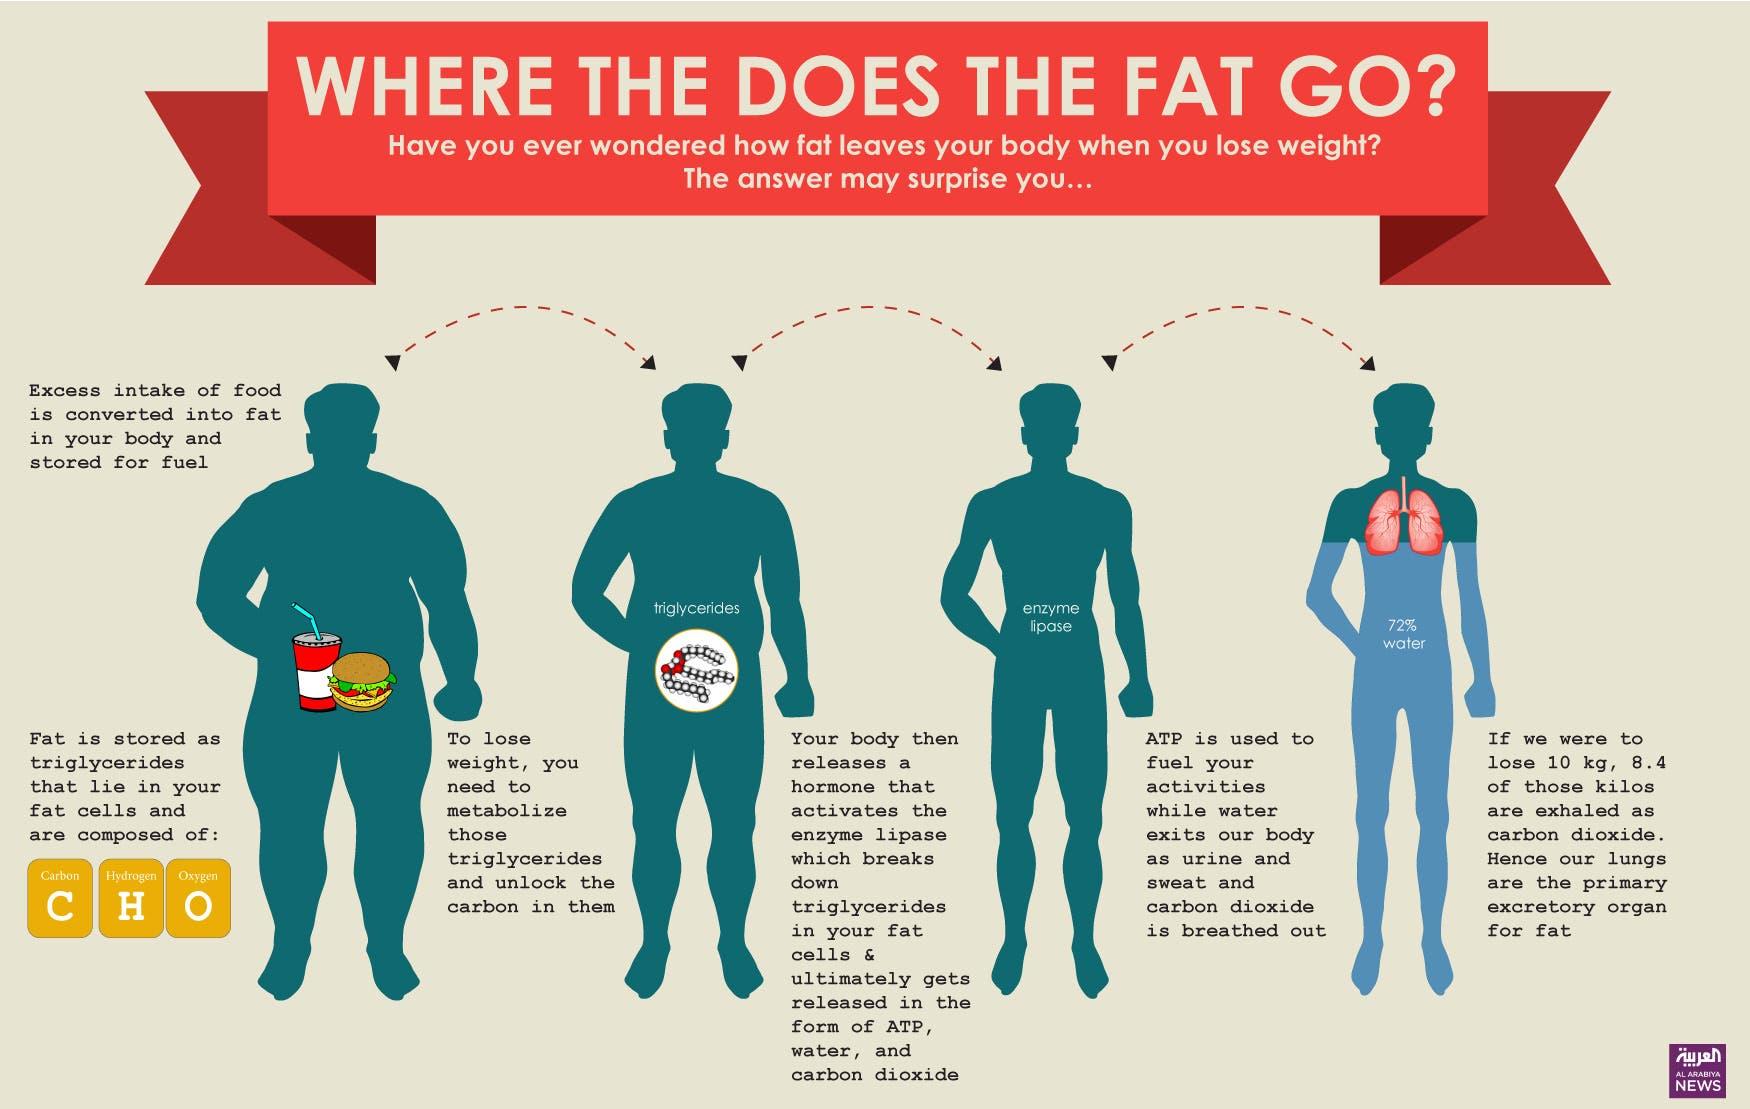 Fat Go 2